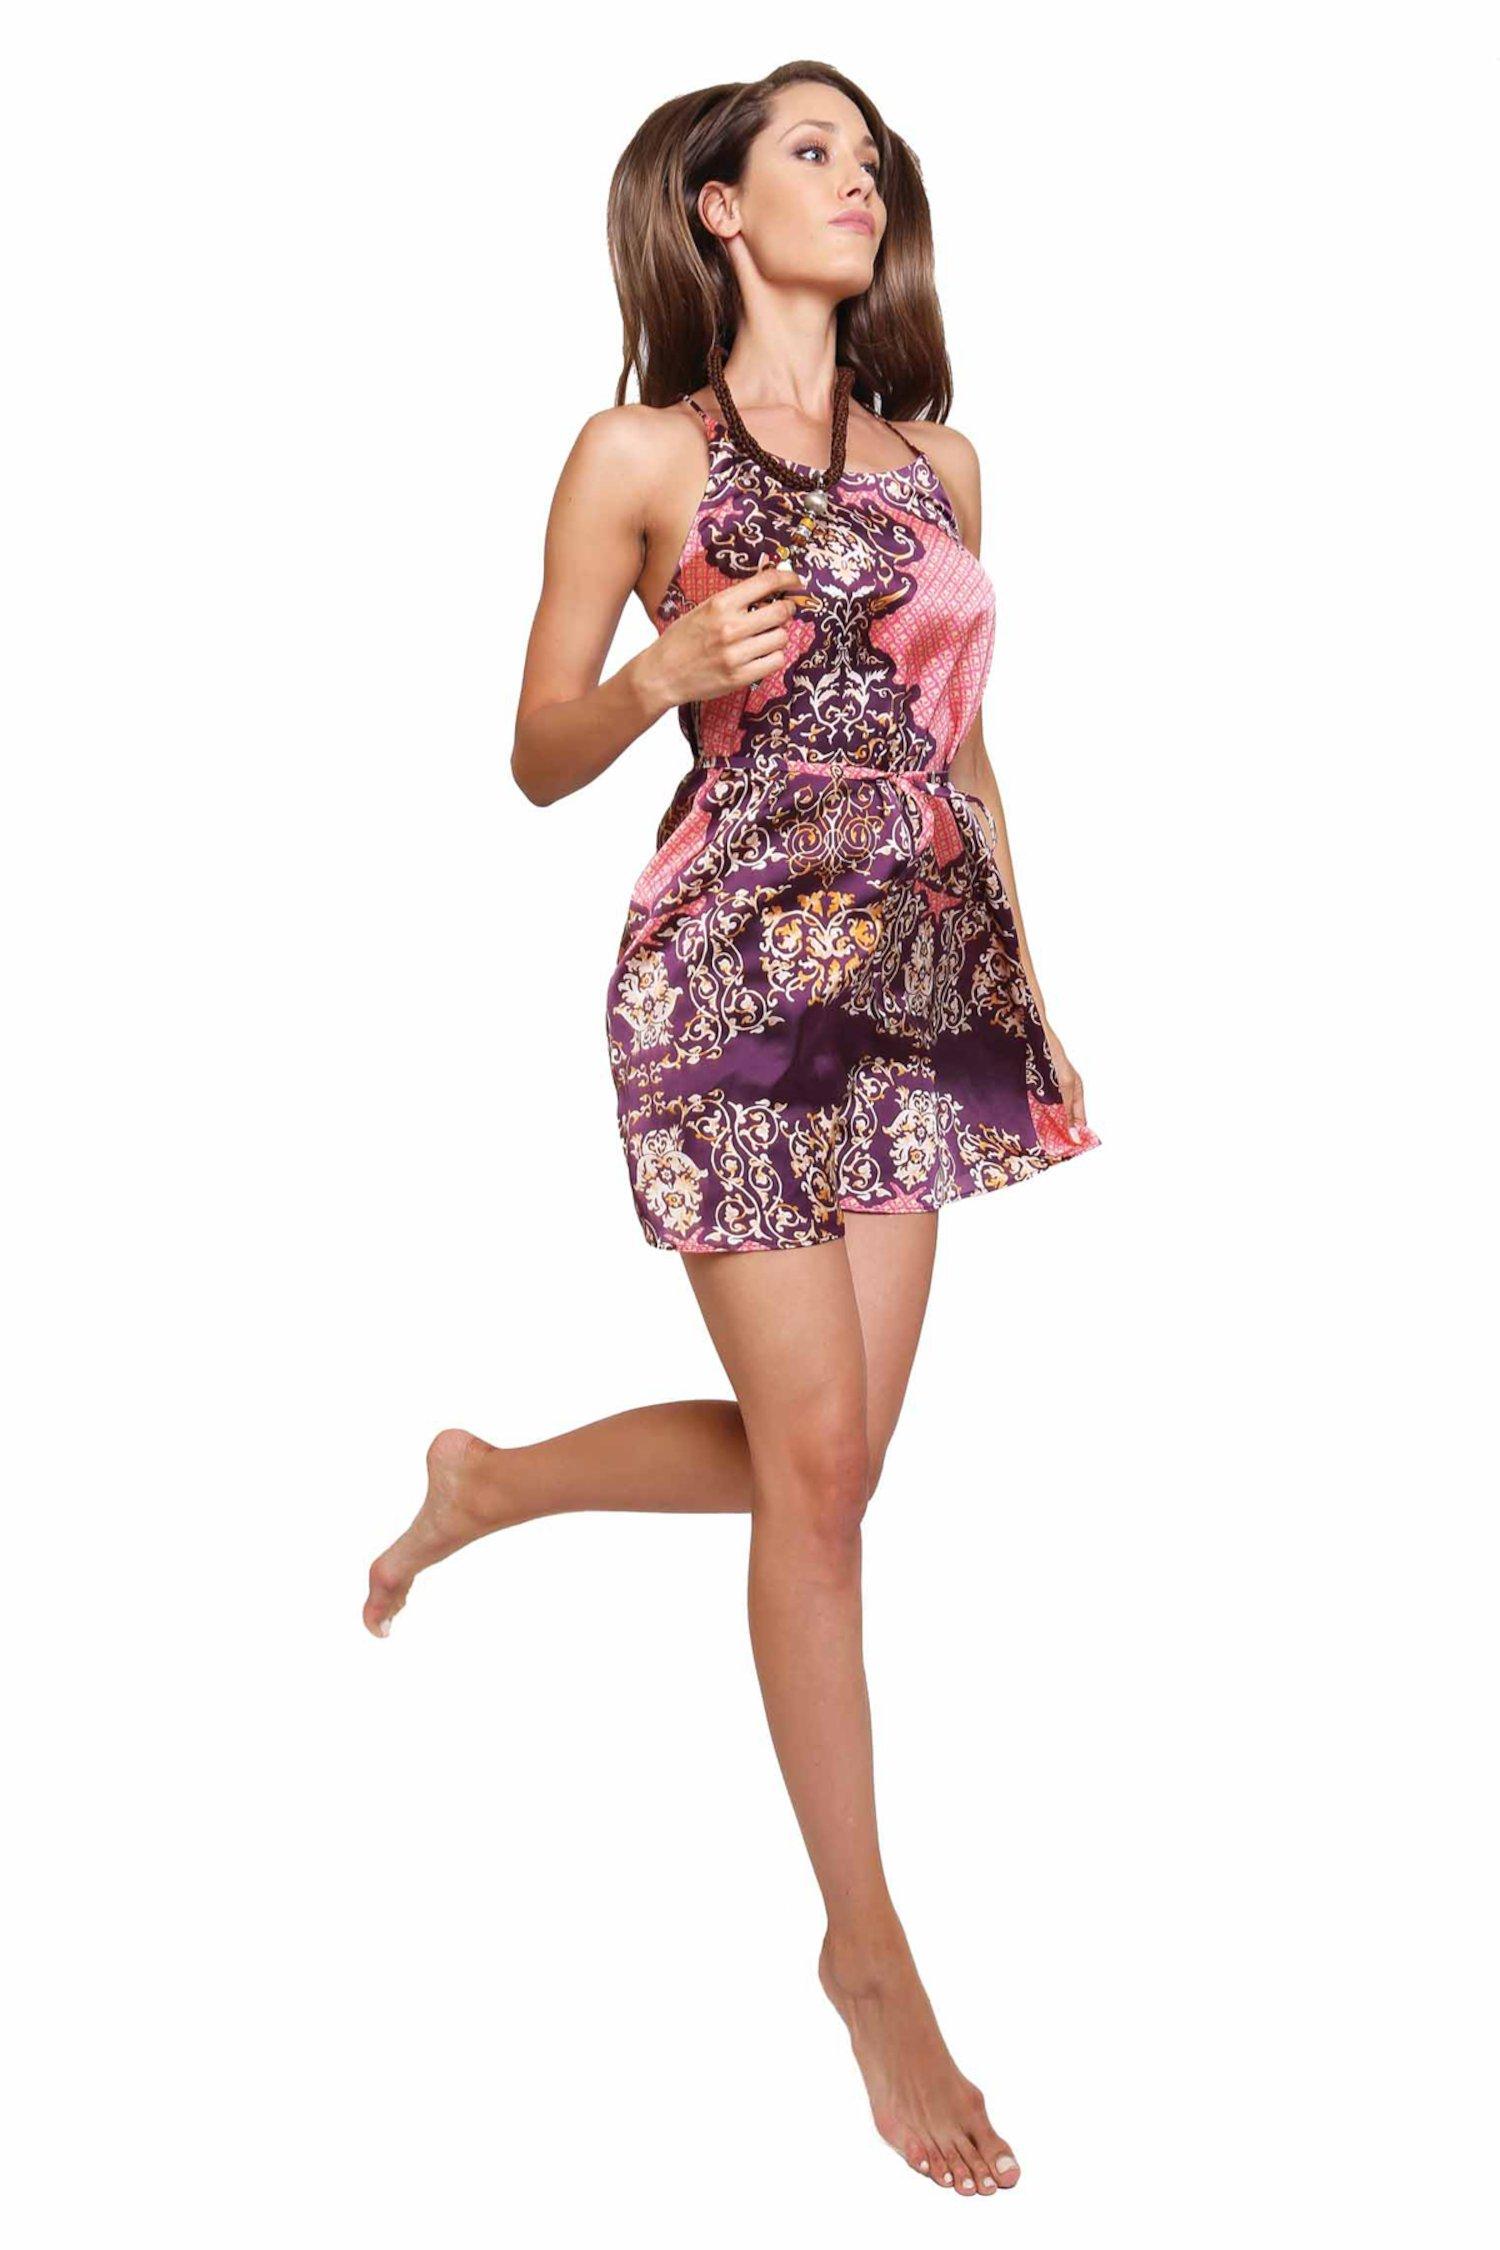 MINI DRESS TRAPEZIUM - India Rosa